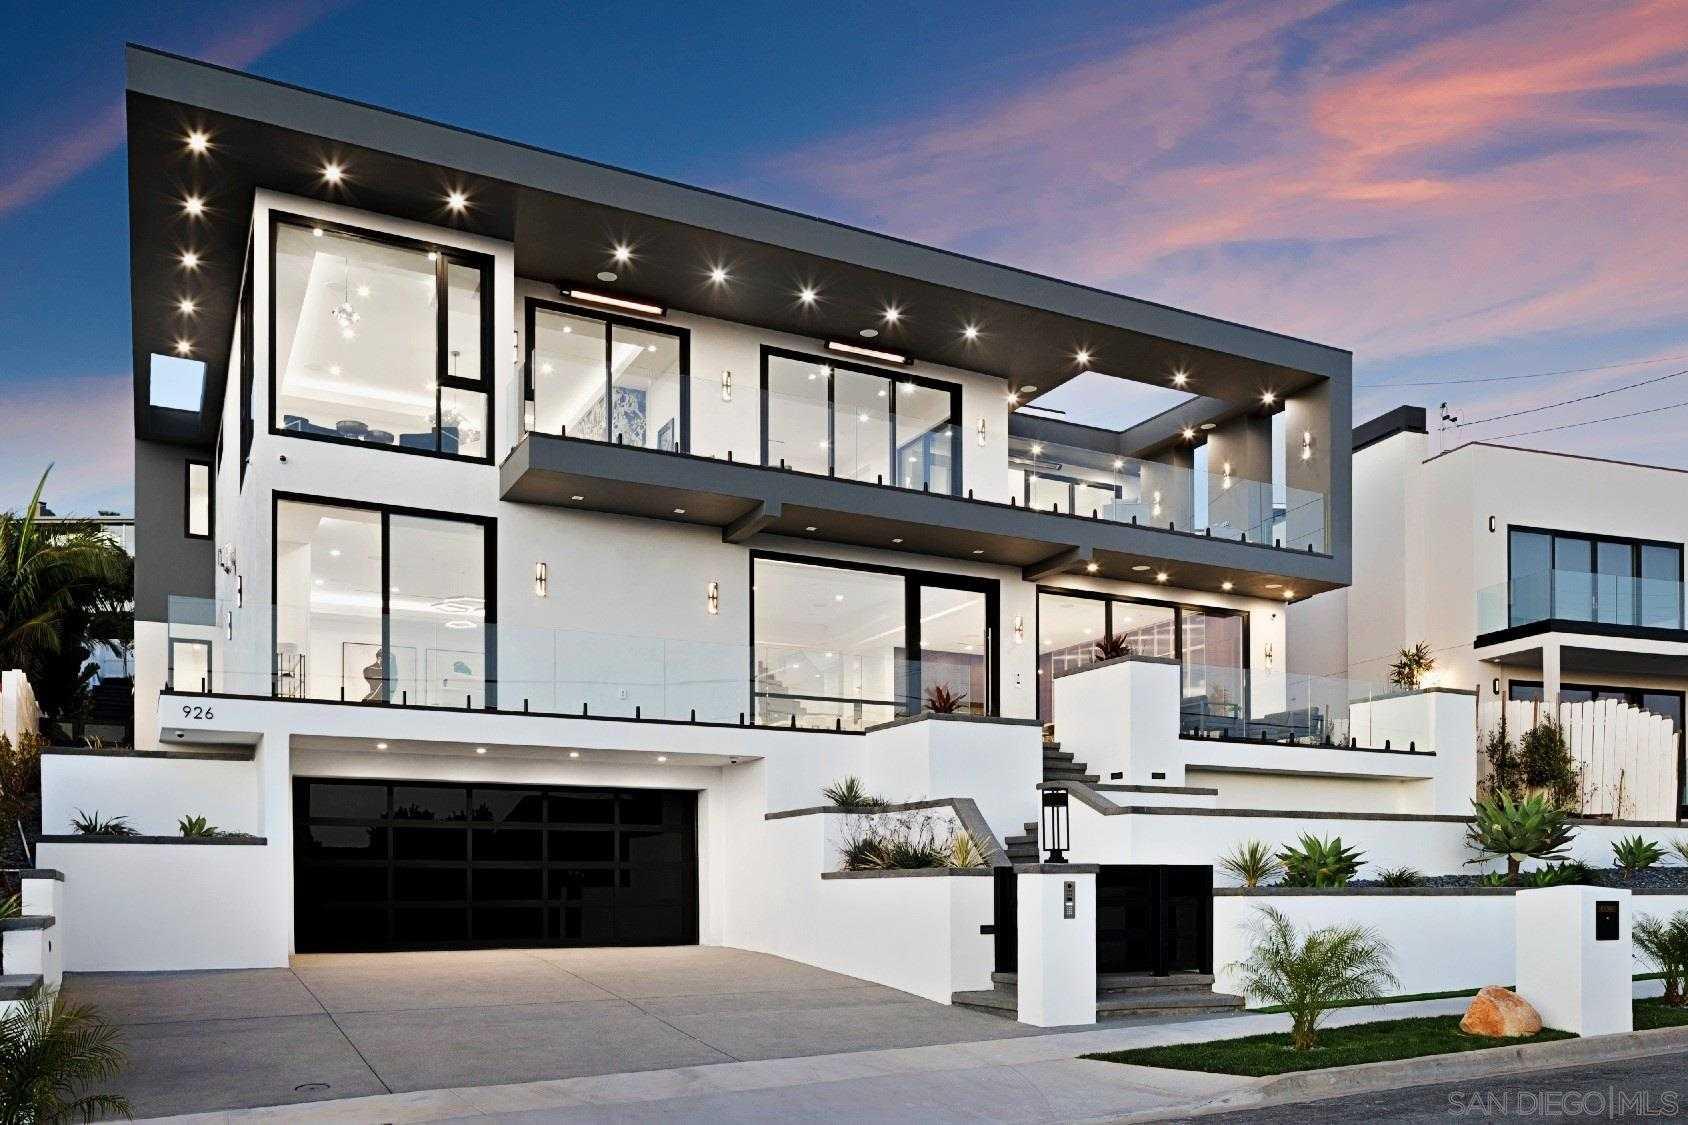 $6,992,000 - 5Br/5Ba -  for Sale in Muirlands, La Jolla